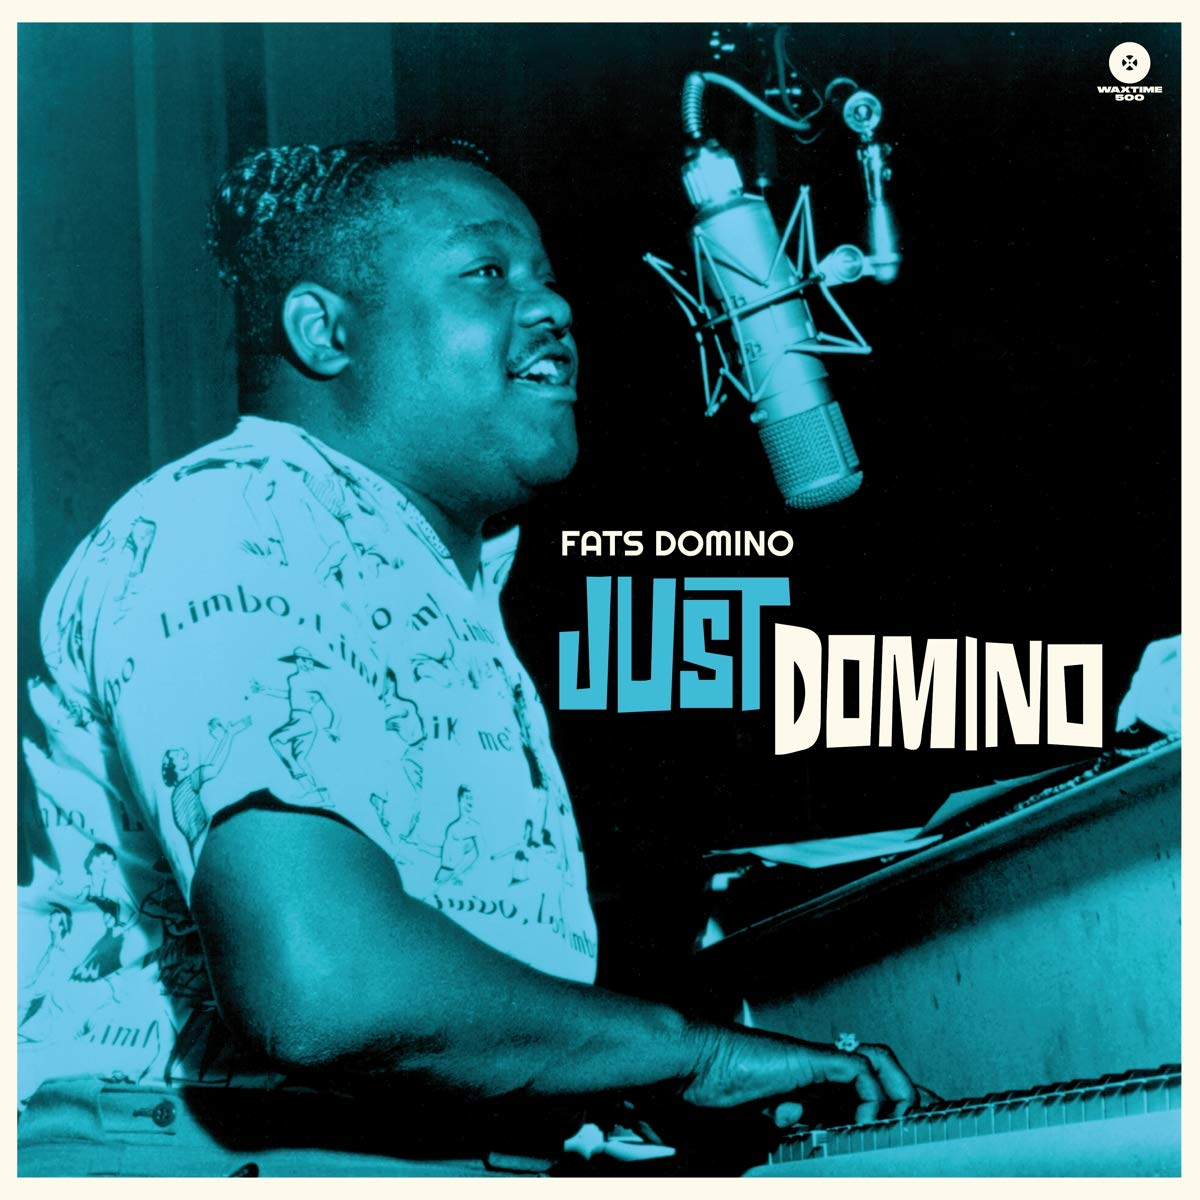 Fats Domino - Just Domino 2 Bonus Tracks Dmm